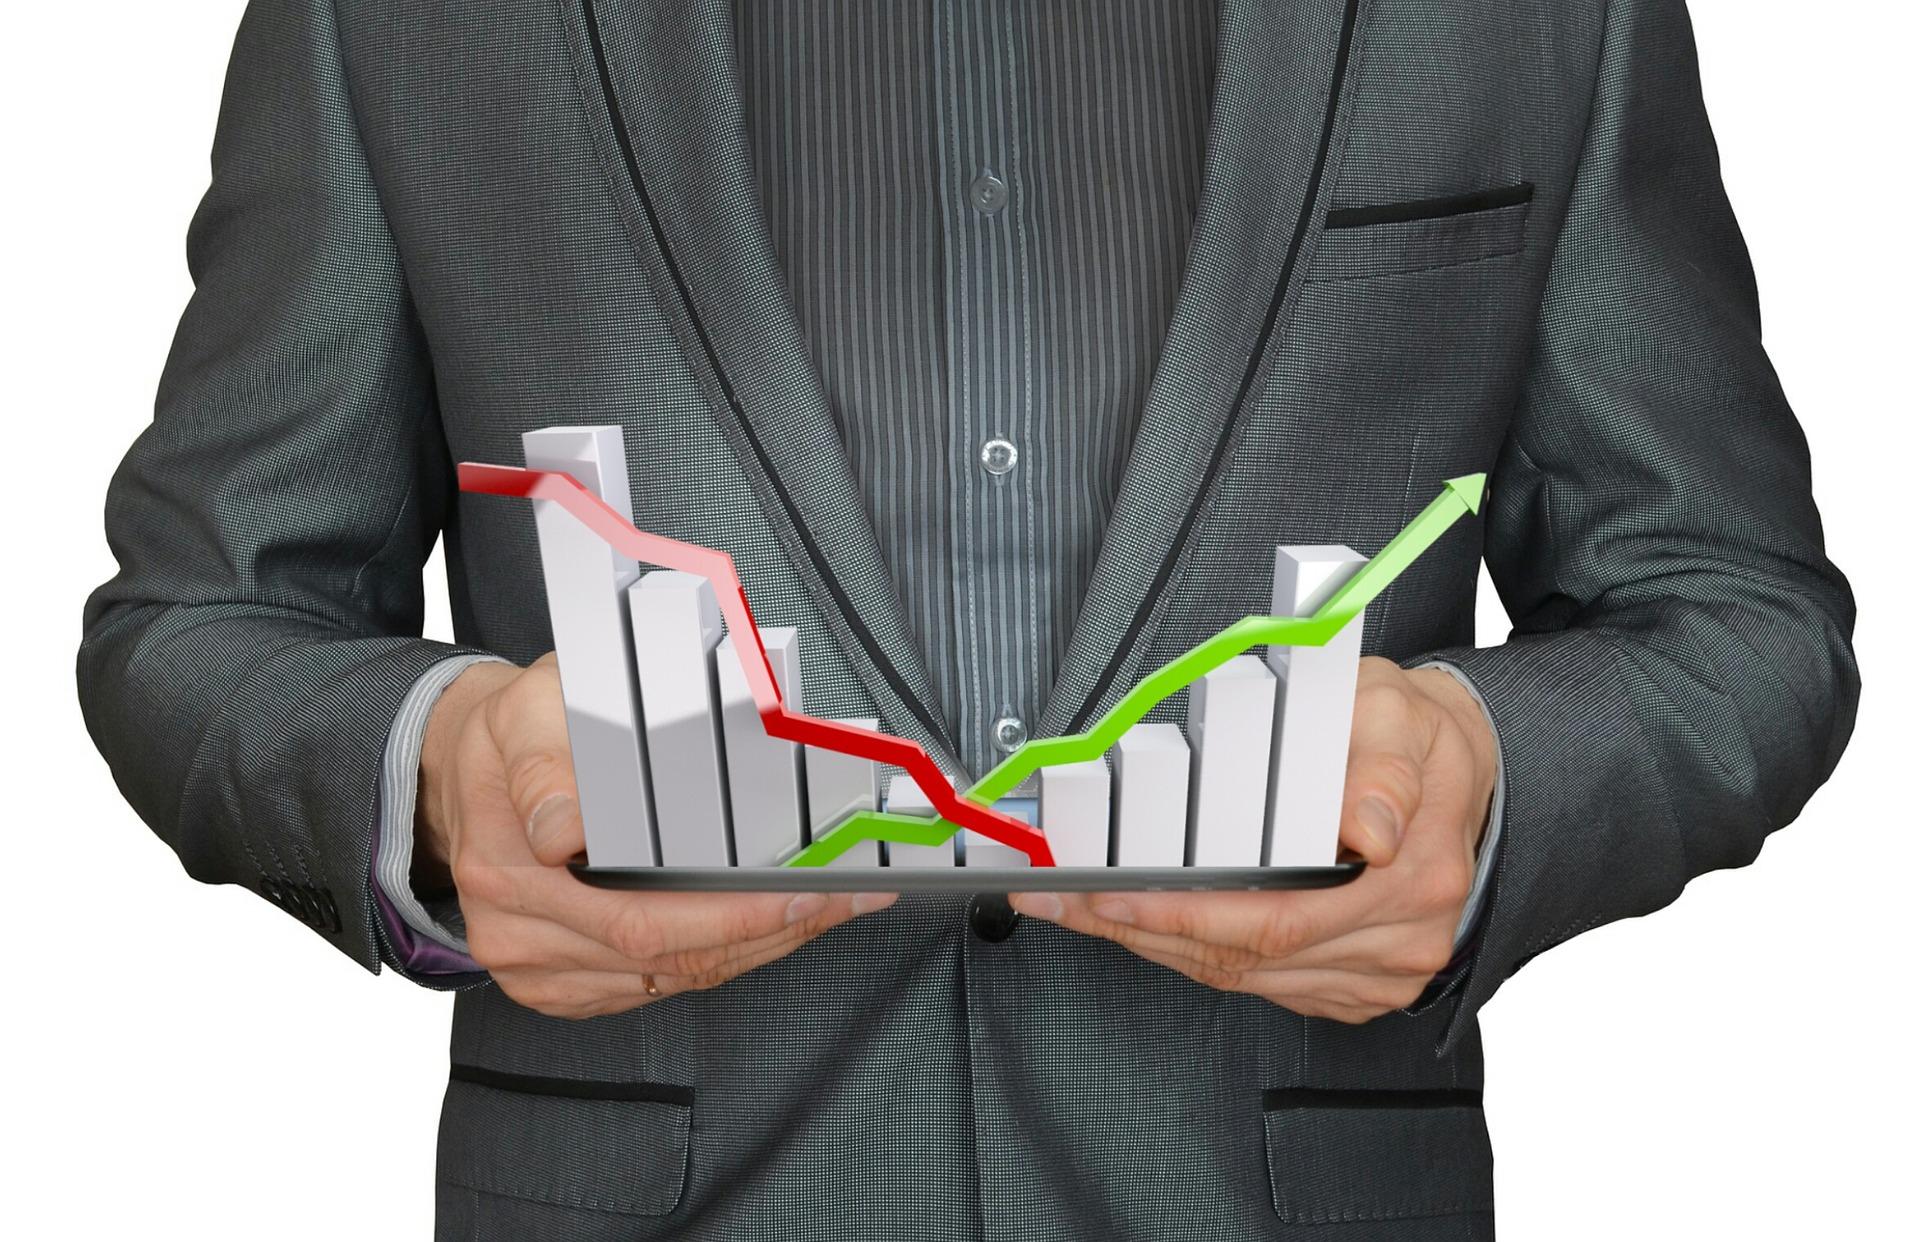 indicadores econômicos